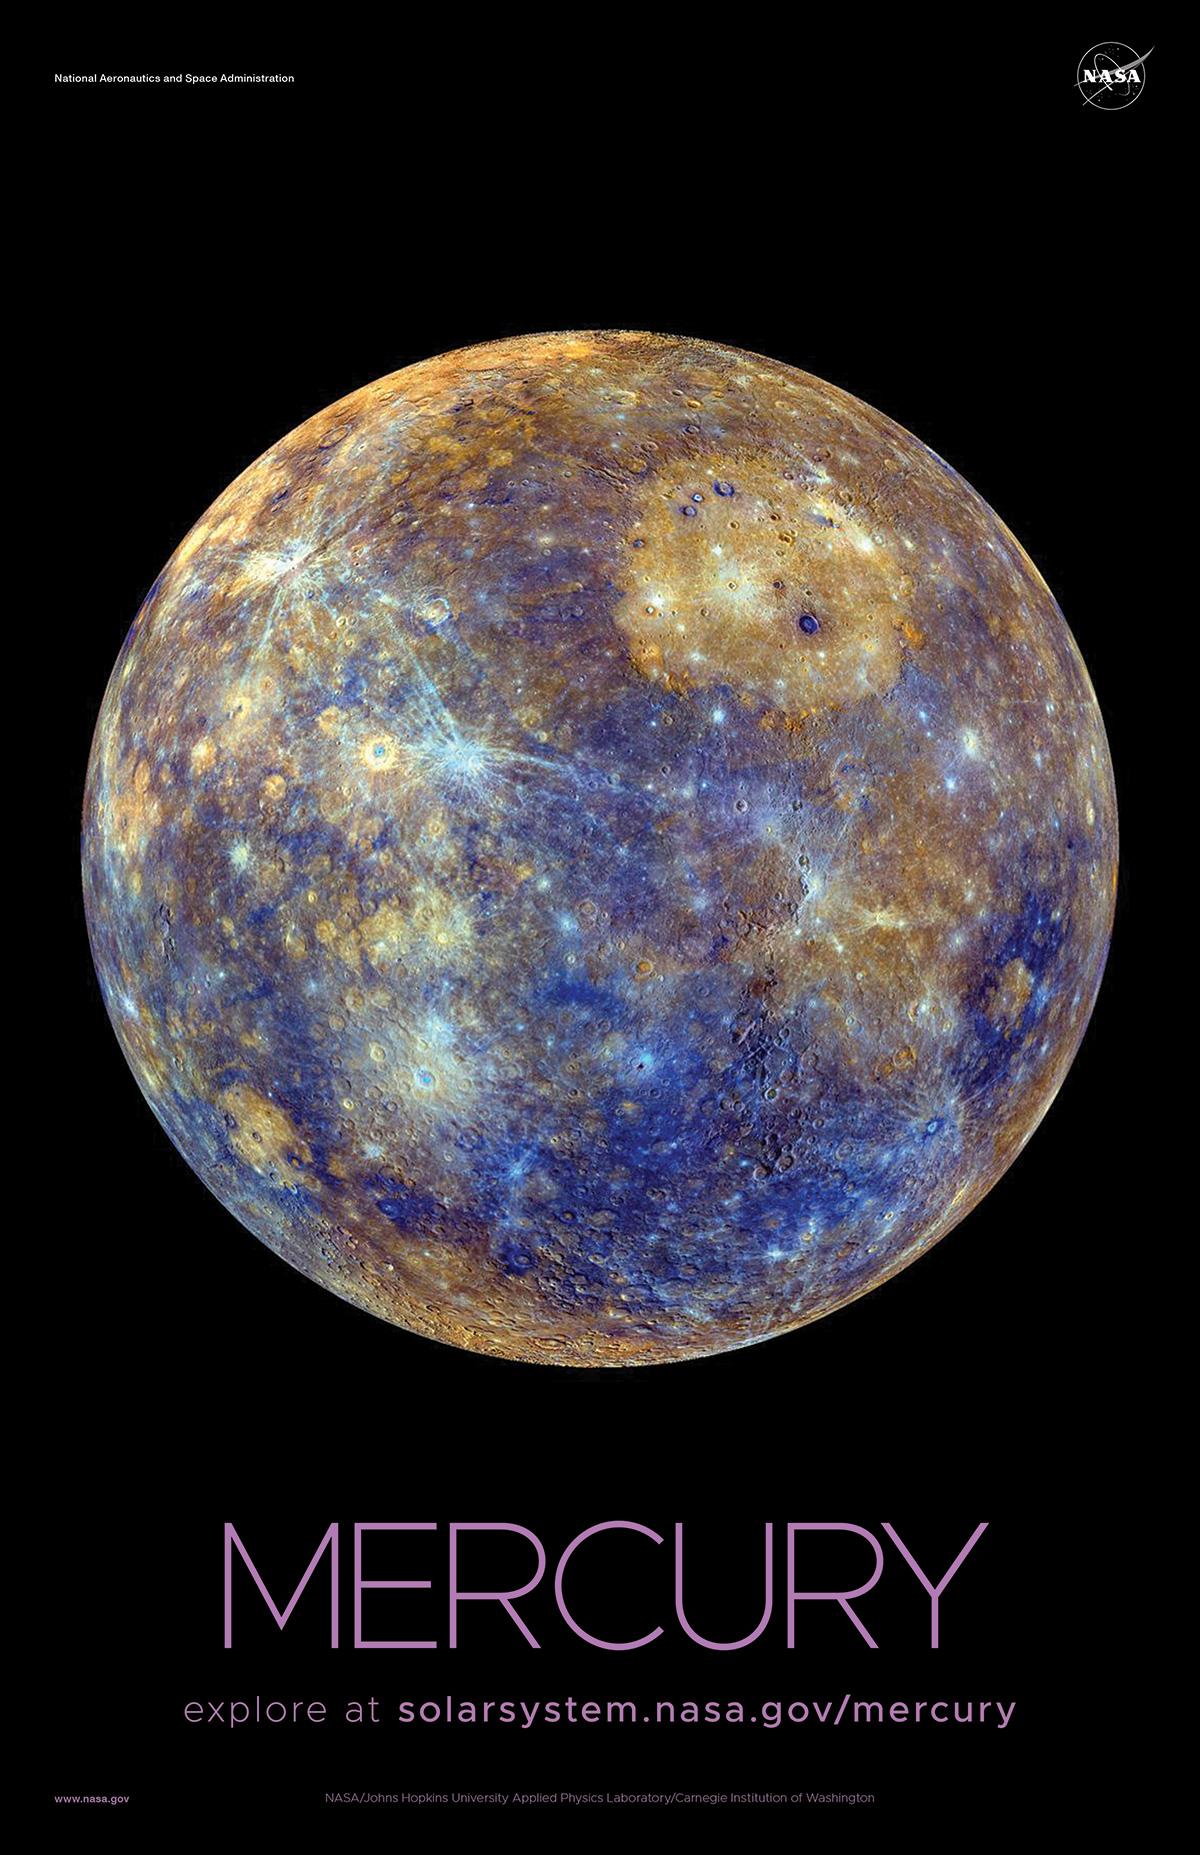 solar system nasa planets - photo #33